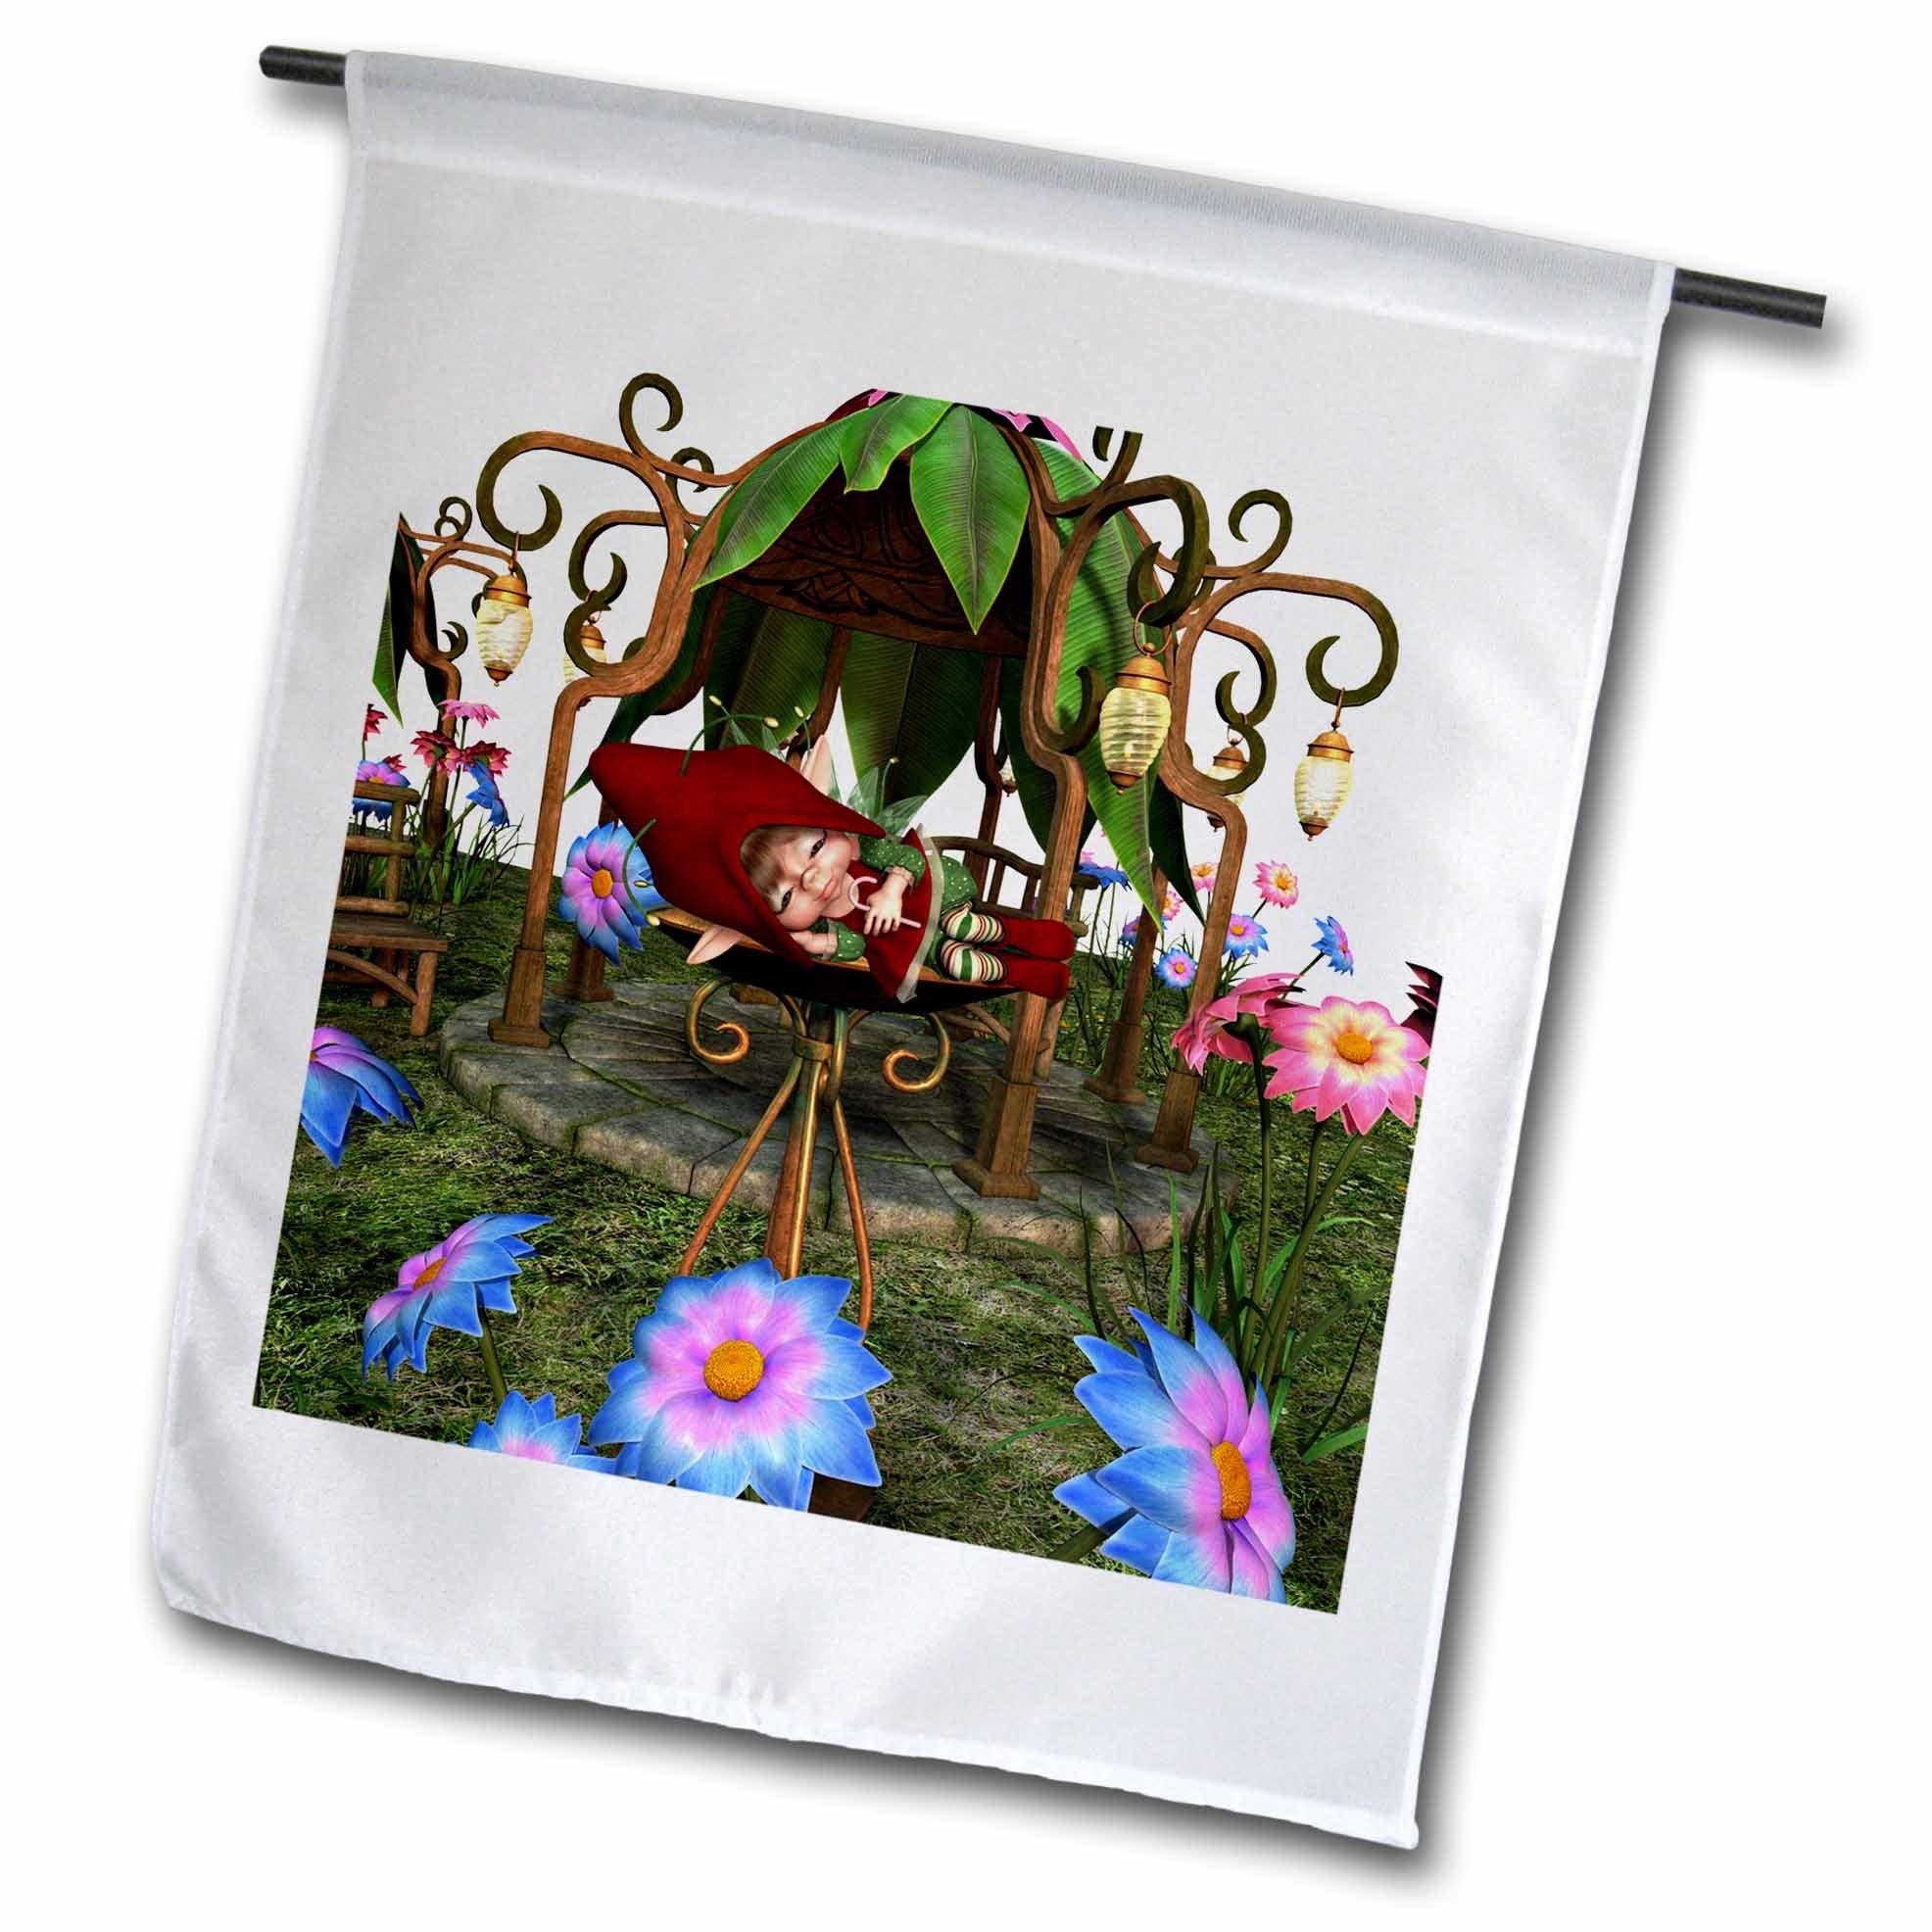 3dRose Spiritual Awakenings Fairies - Sleeping baby fairy in a garden fountain among the flowers - 18 x 27 inch Garden Flag (fl_273421_2)